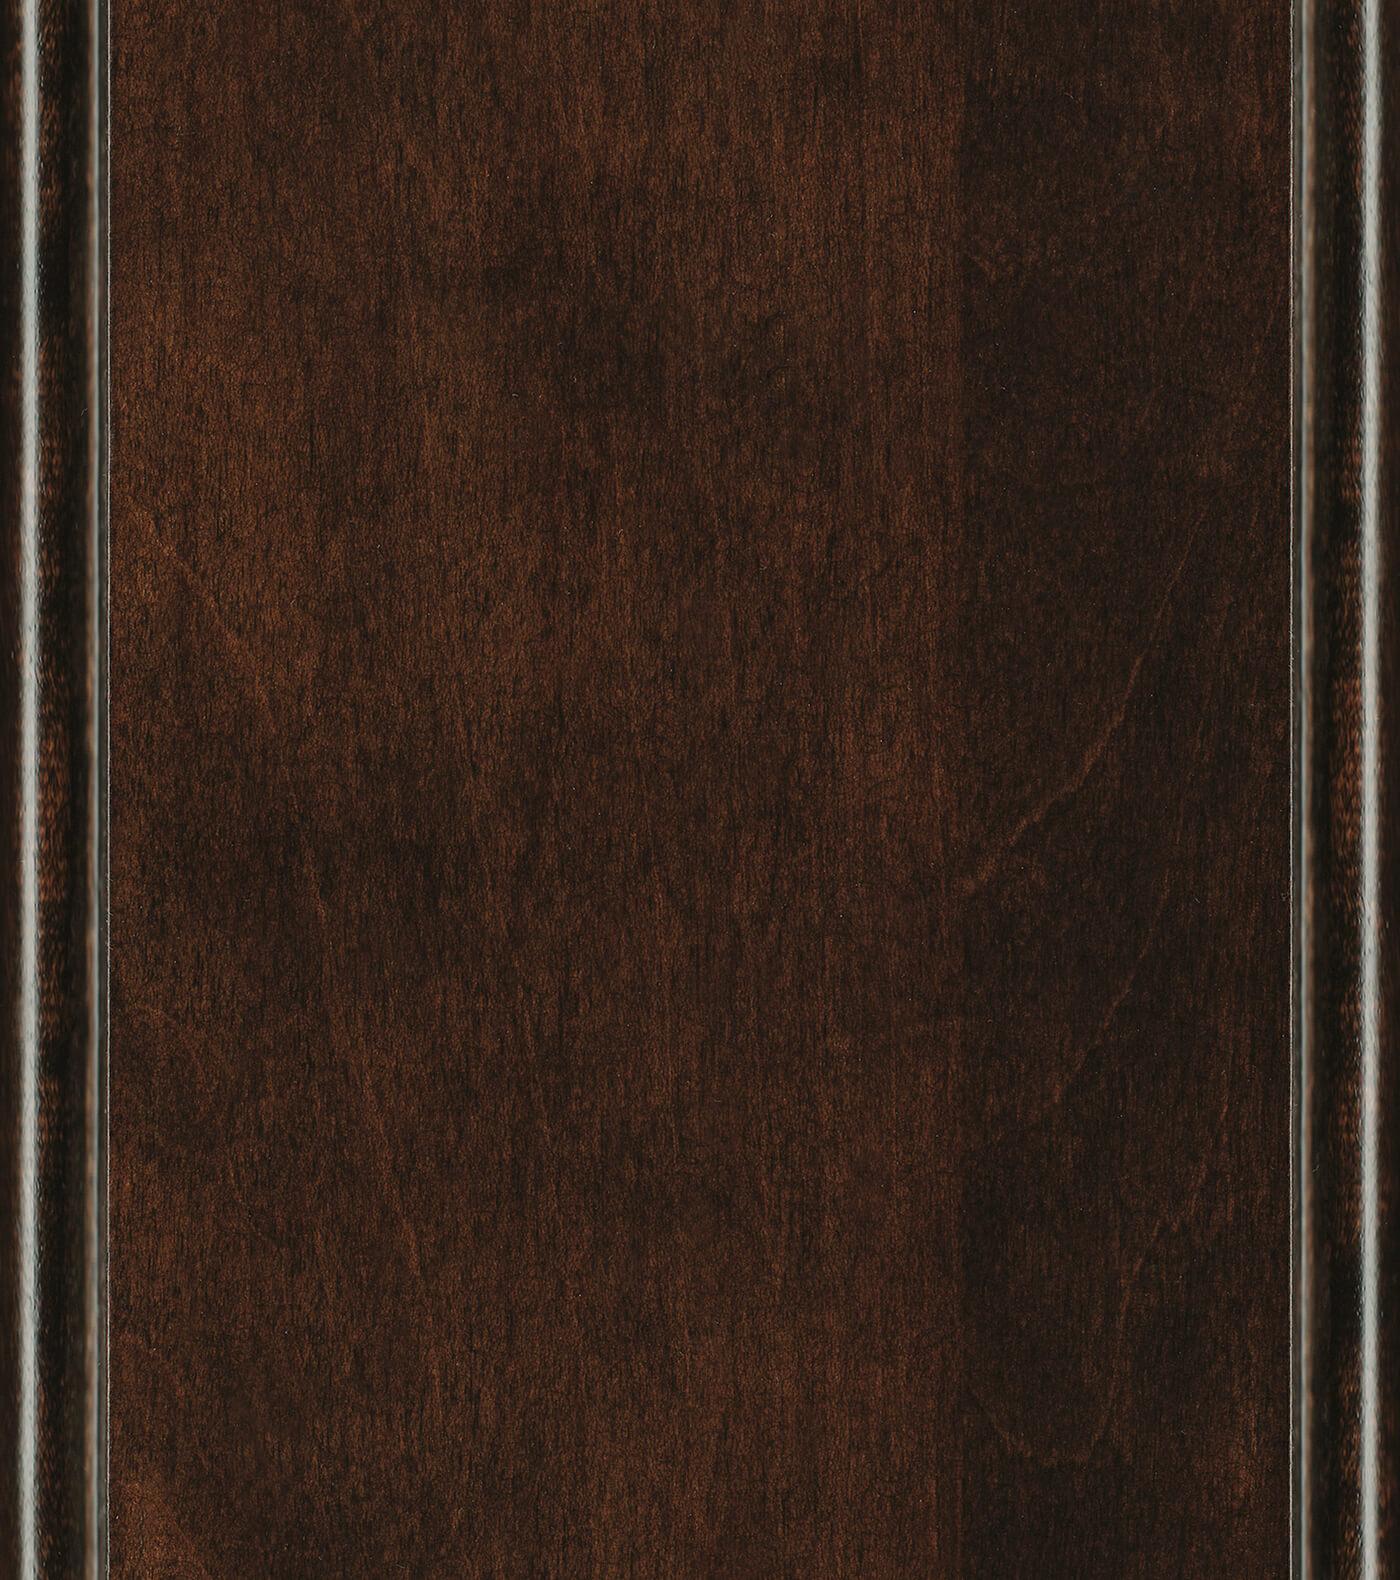 Java Stain on Maple